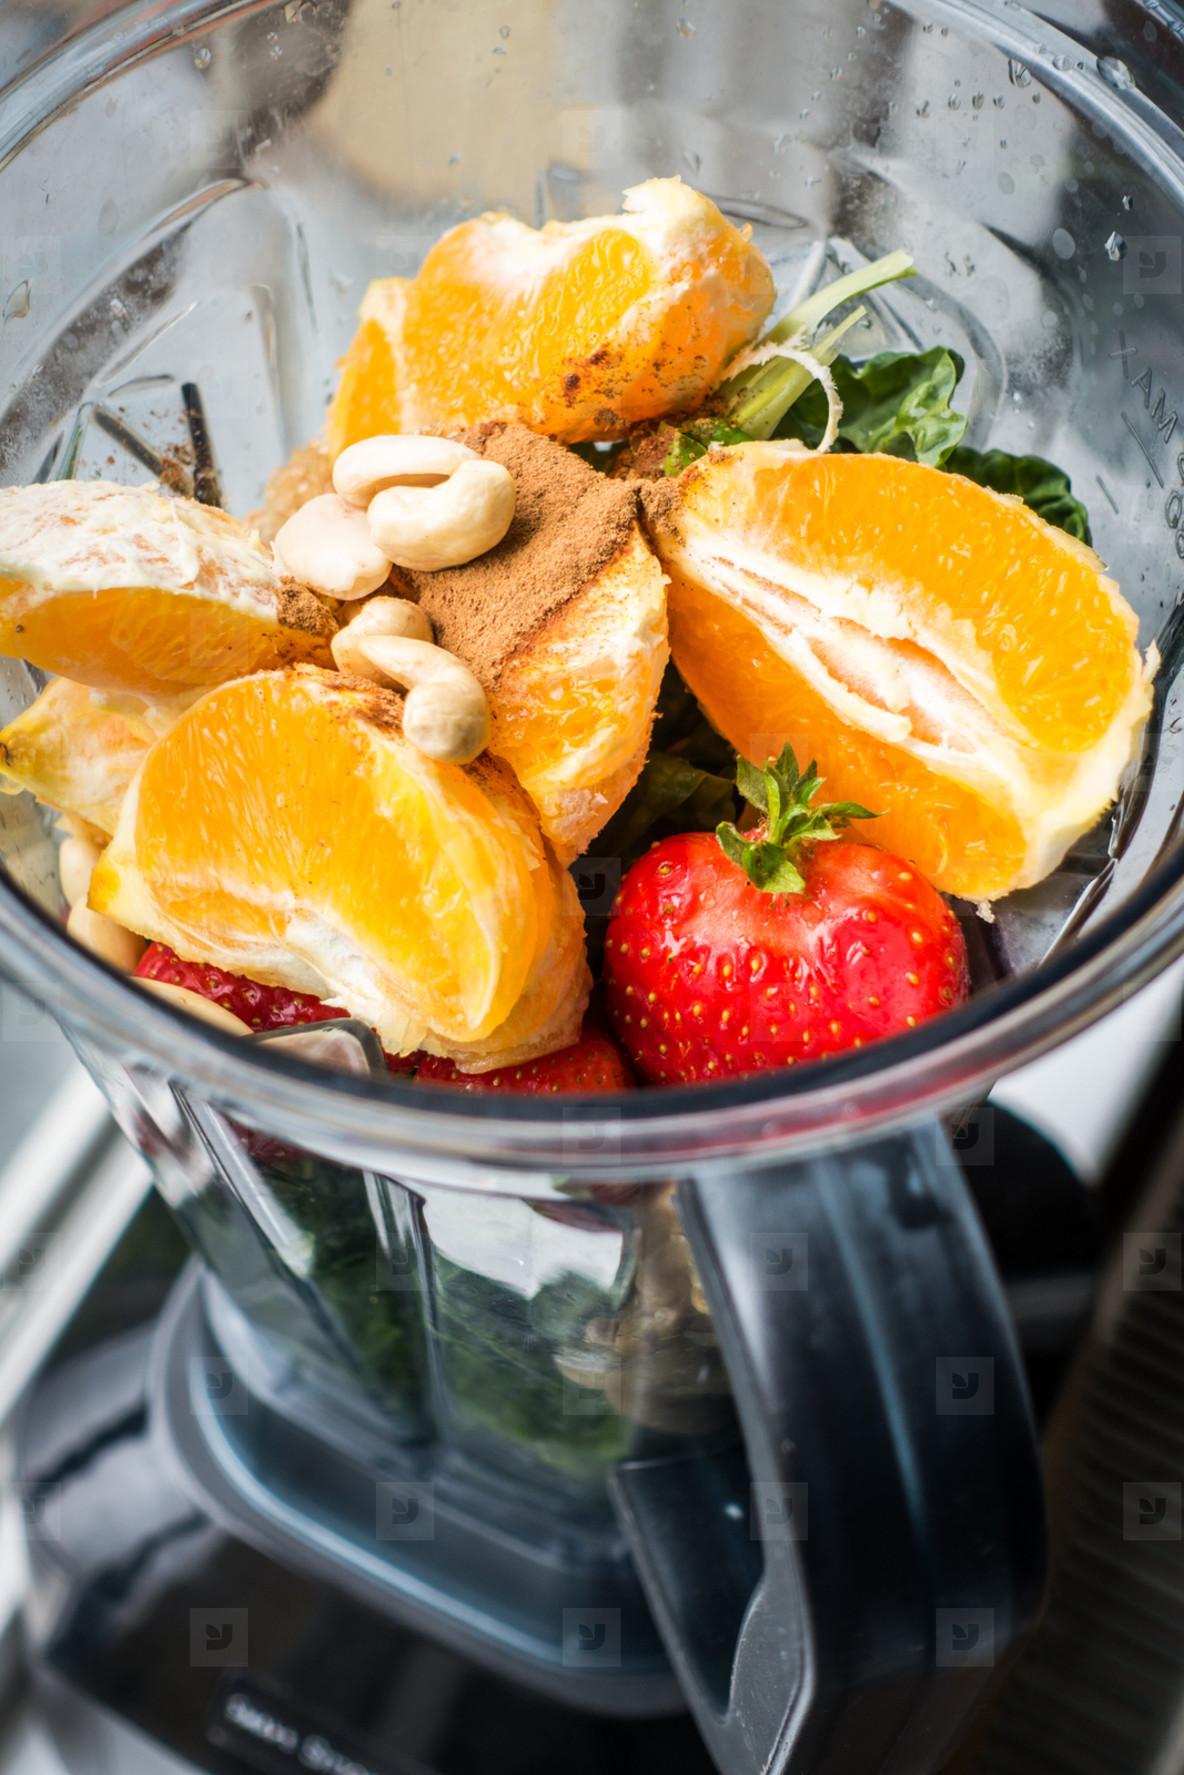 Orange and strawberry smoothie